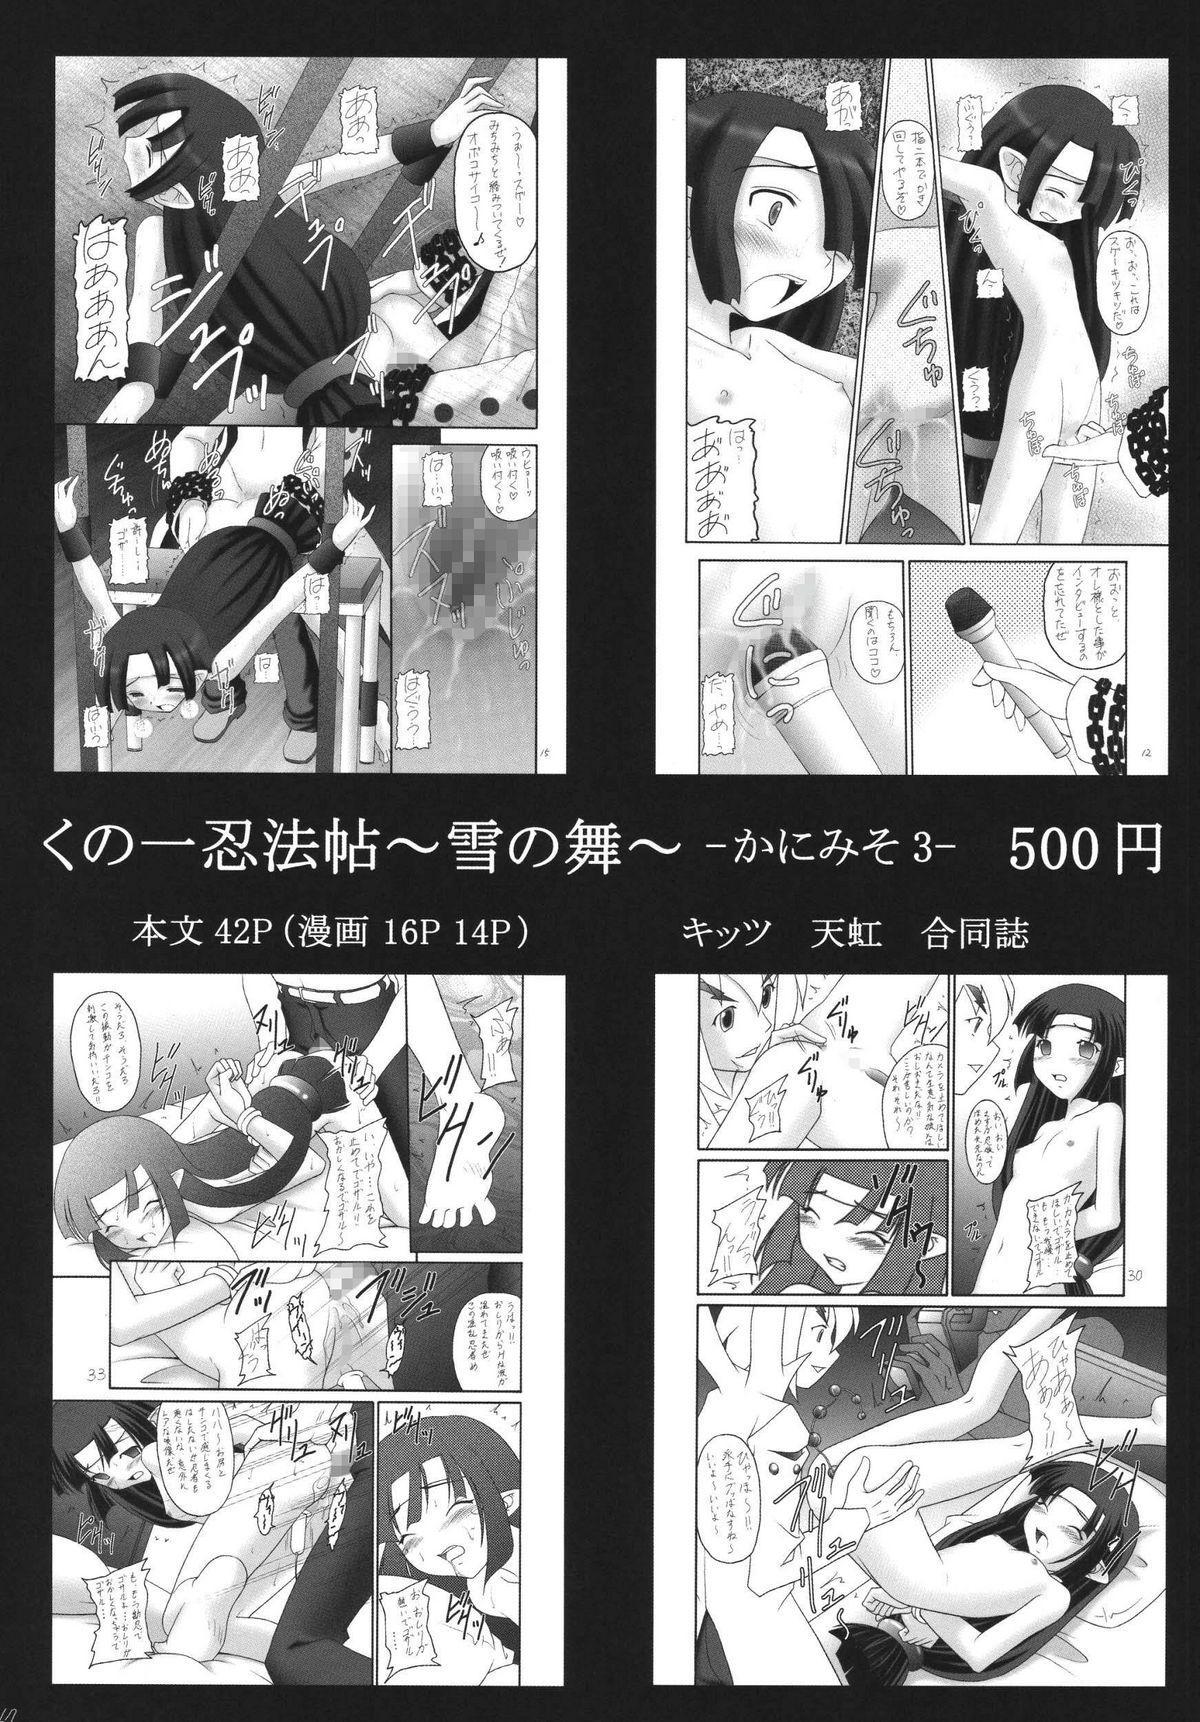 Kanimiso Vol. 4 - Love Dynamites 45